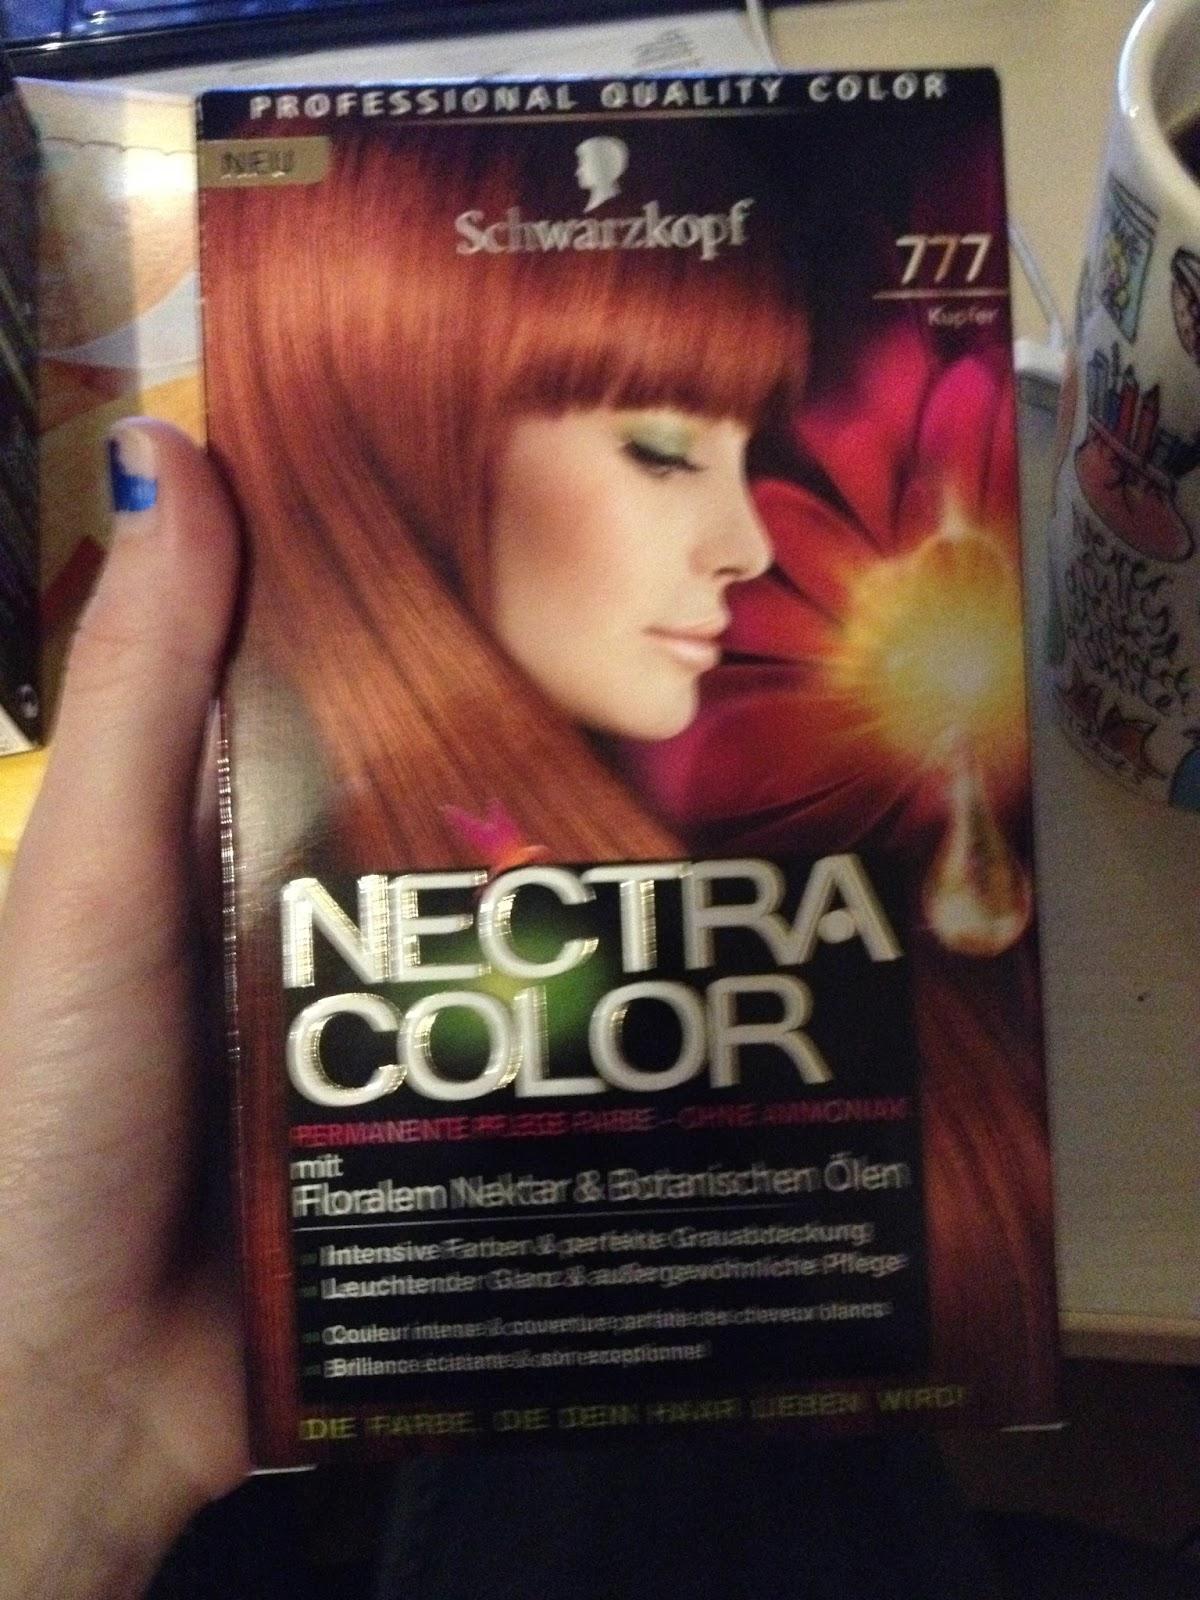 rot gefarbte haare kupfer farben frisuren beliebt in. Black Bedroom Furniture Sets. Home Design Ideas